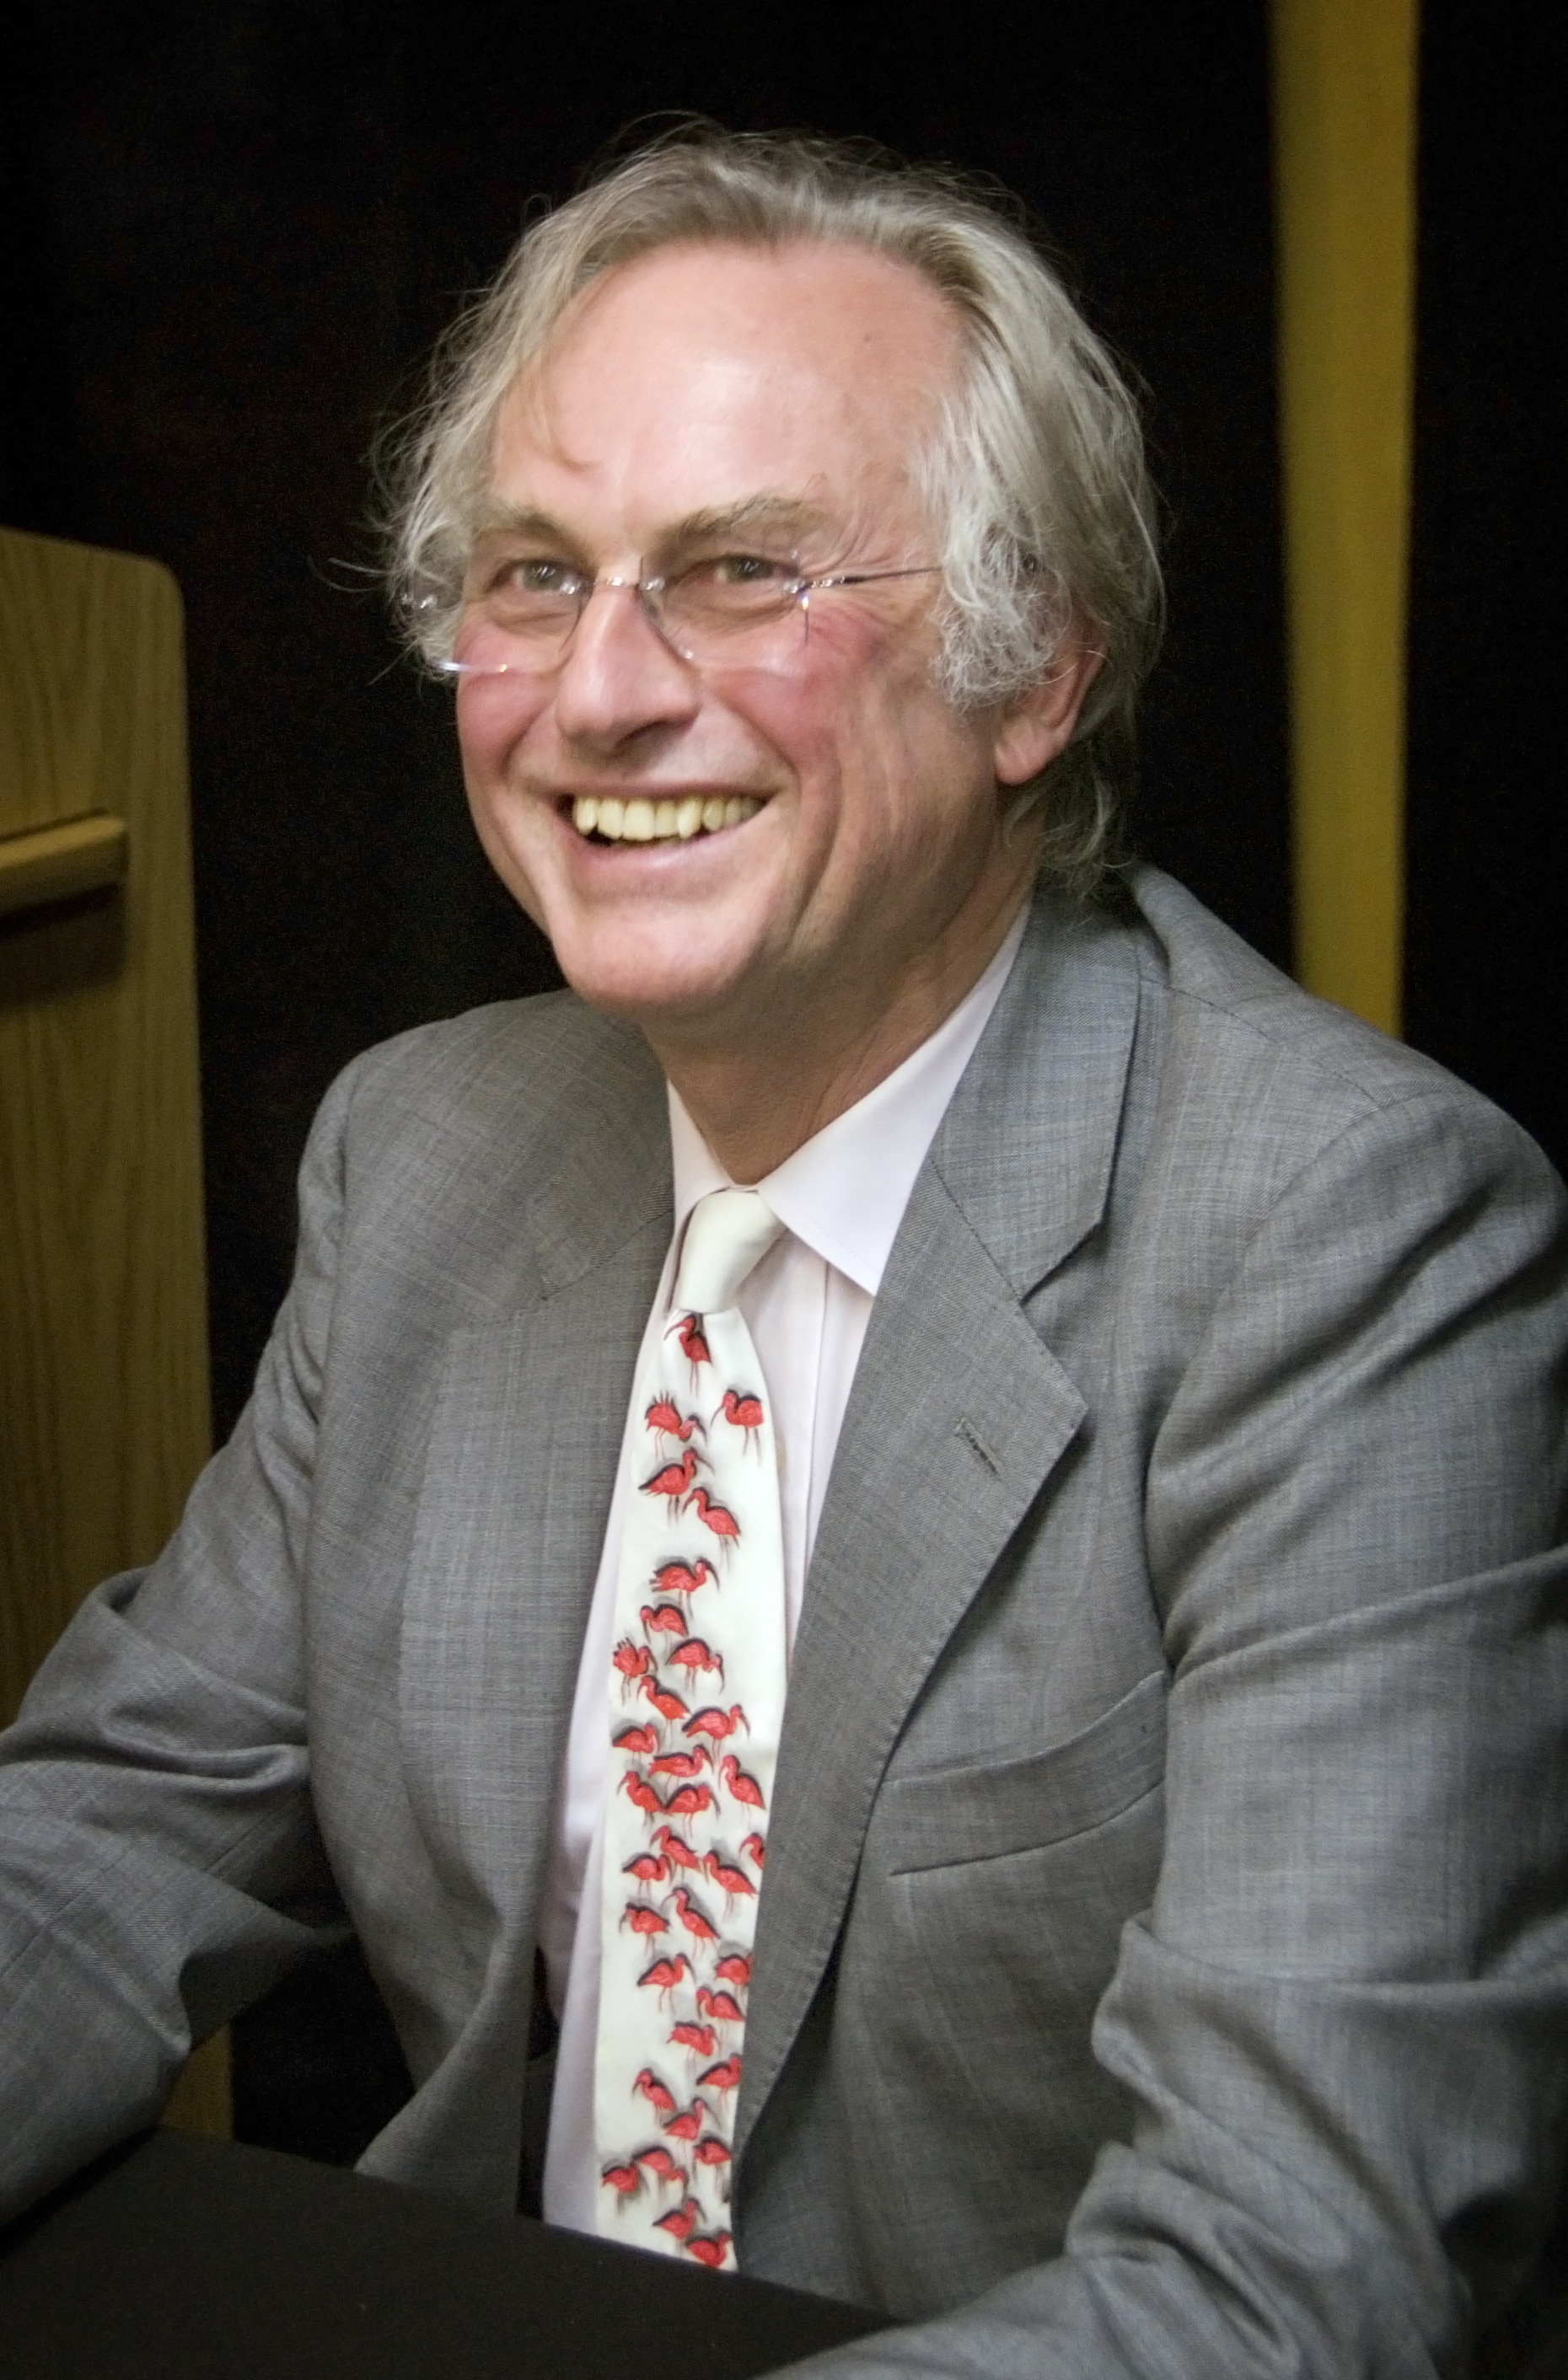 filerichard dawkins 2009jpg wikipedia